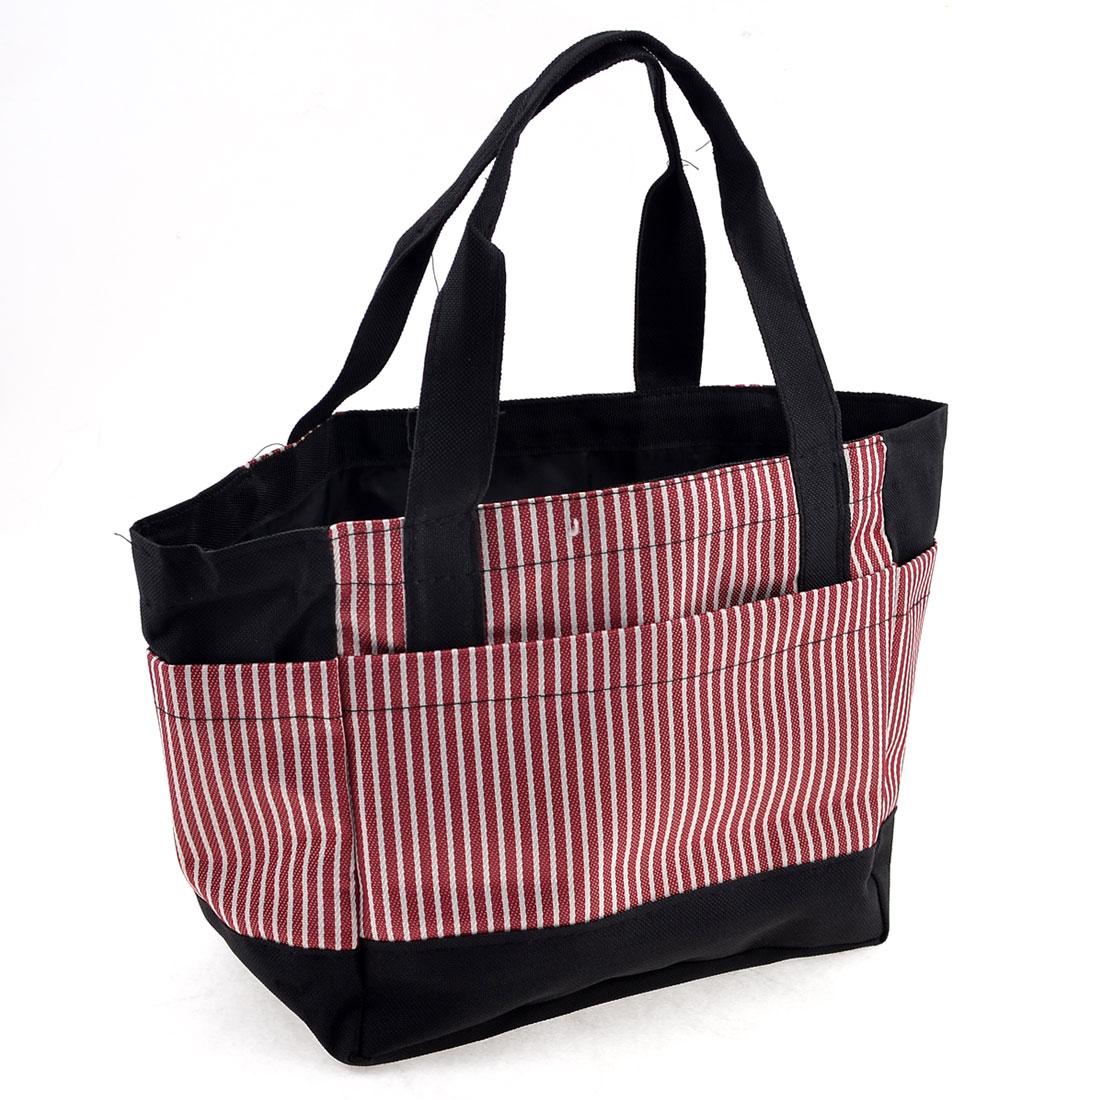 Ladies Stripes Pattern Nylon Shopping Handbag Tote Red White